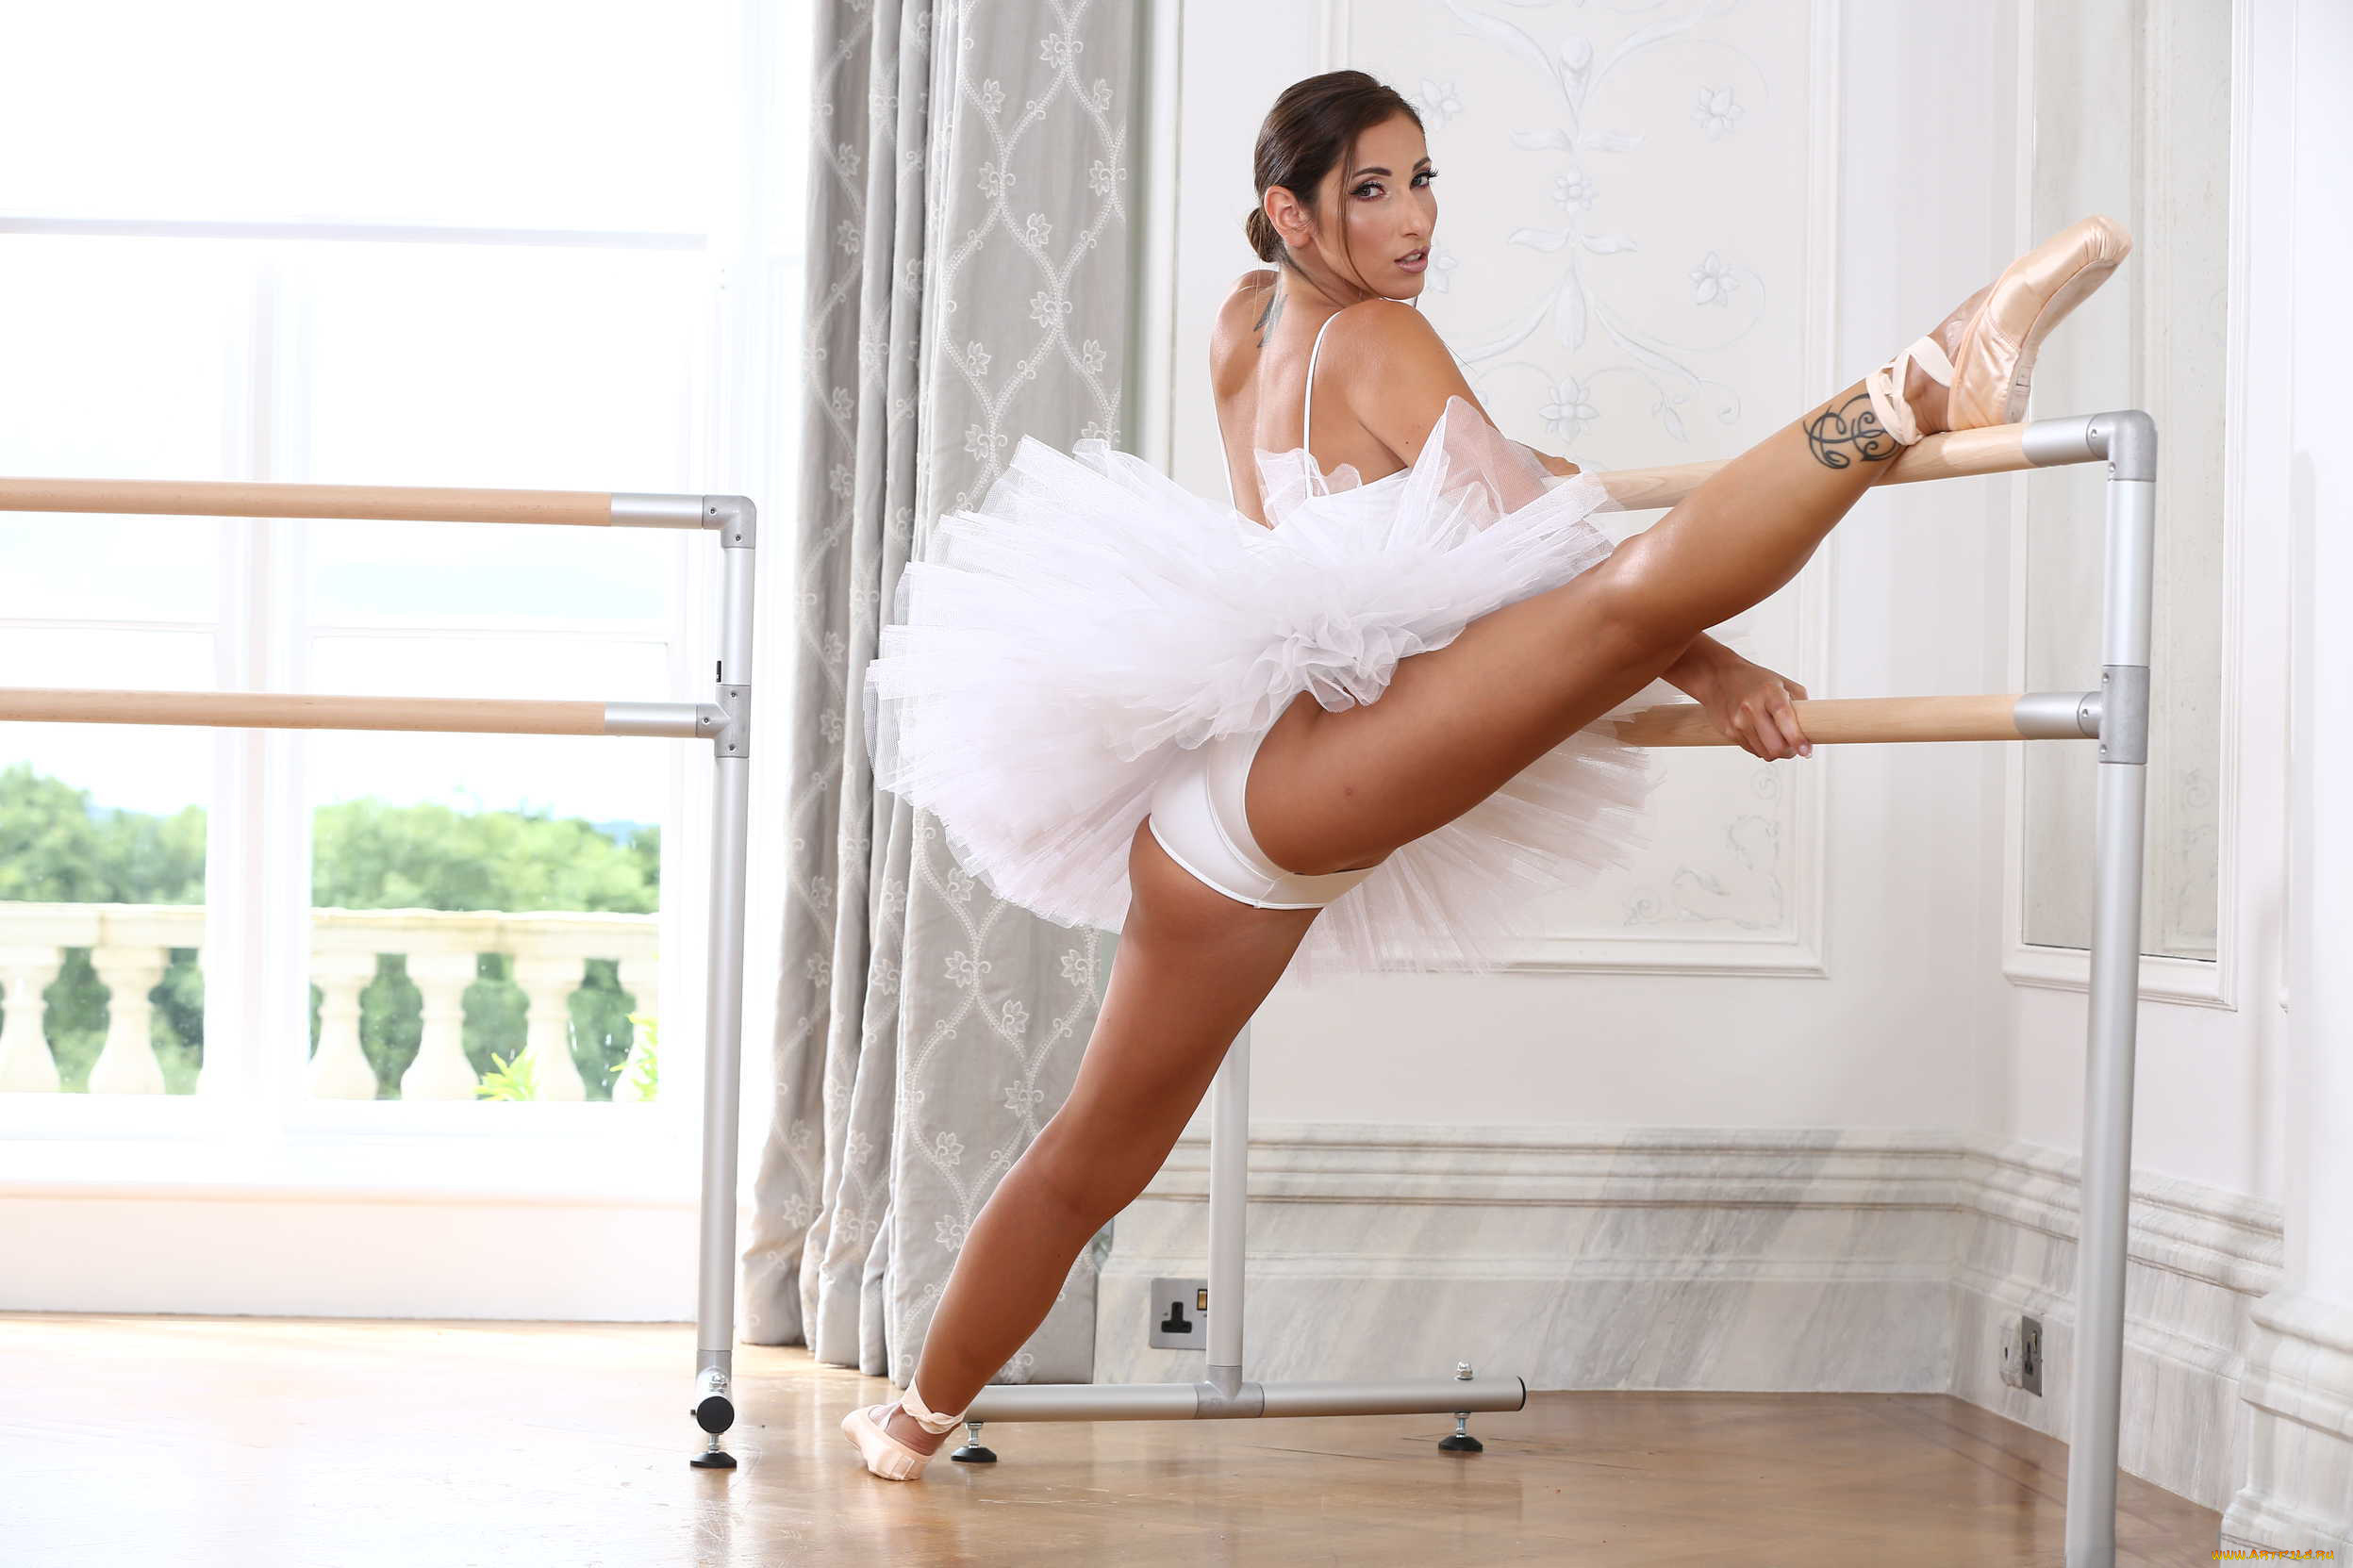 Фотогалерея голых балерин — photo 10